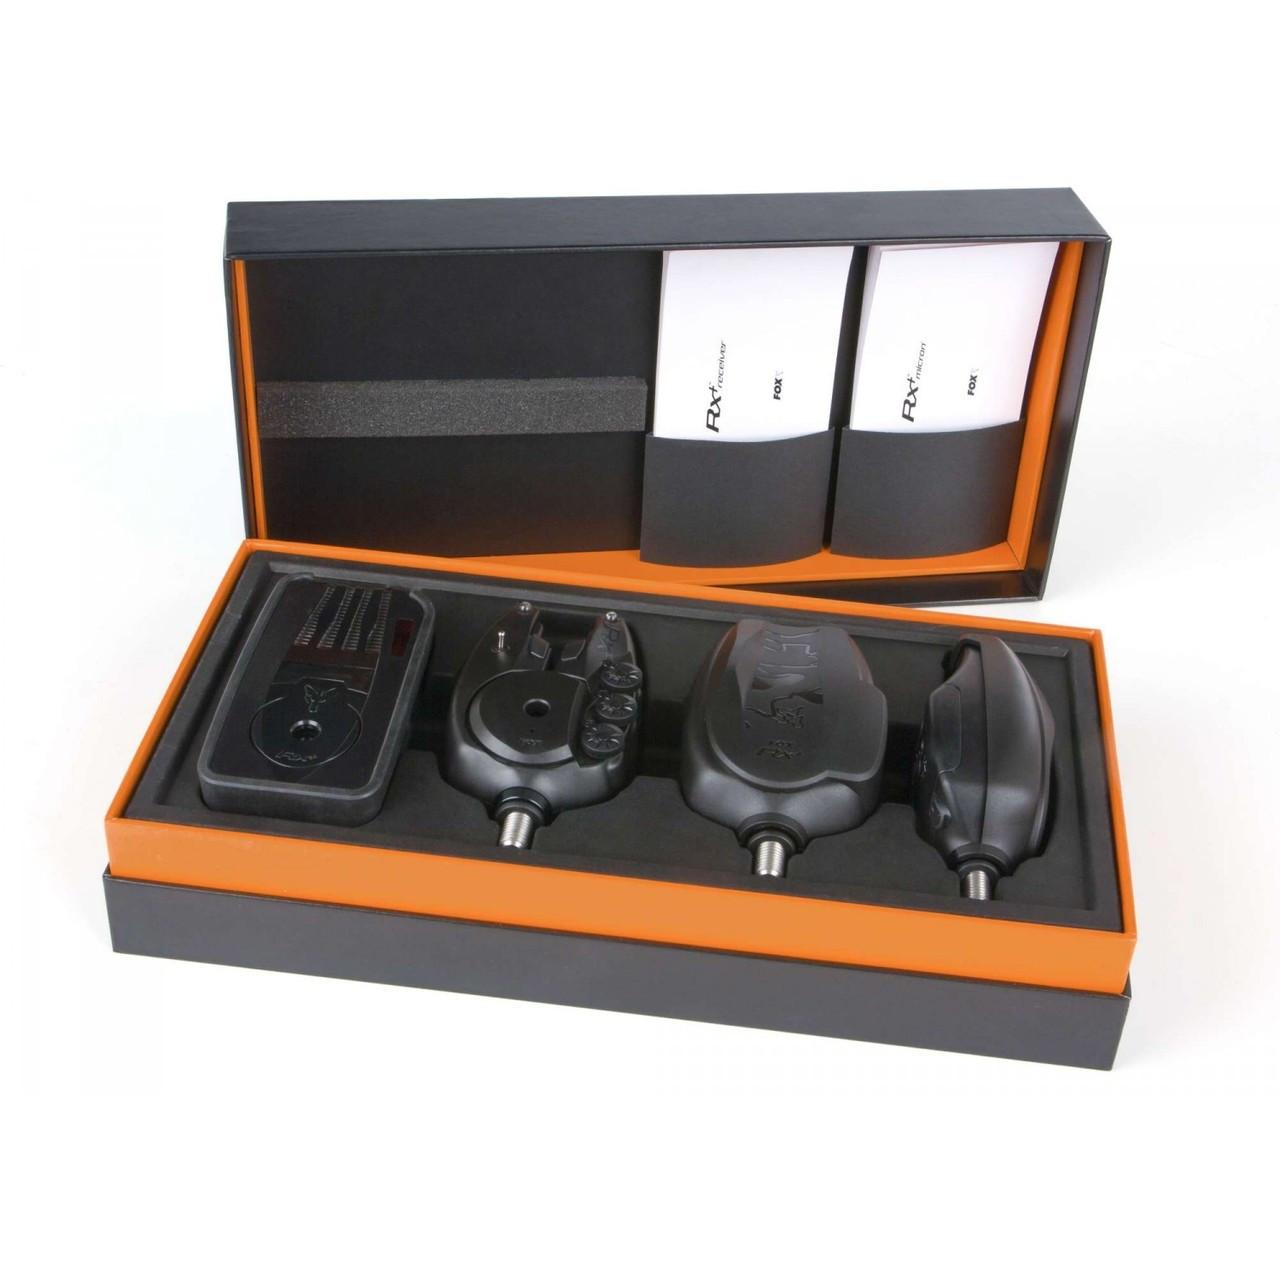 Fox Micron RX+ Bite Alarm 3 Rod Set